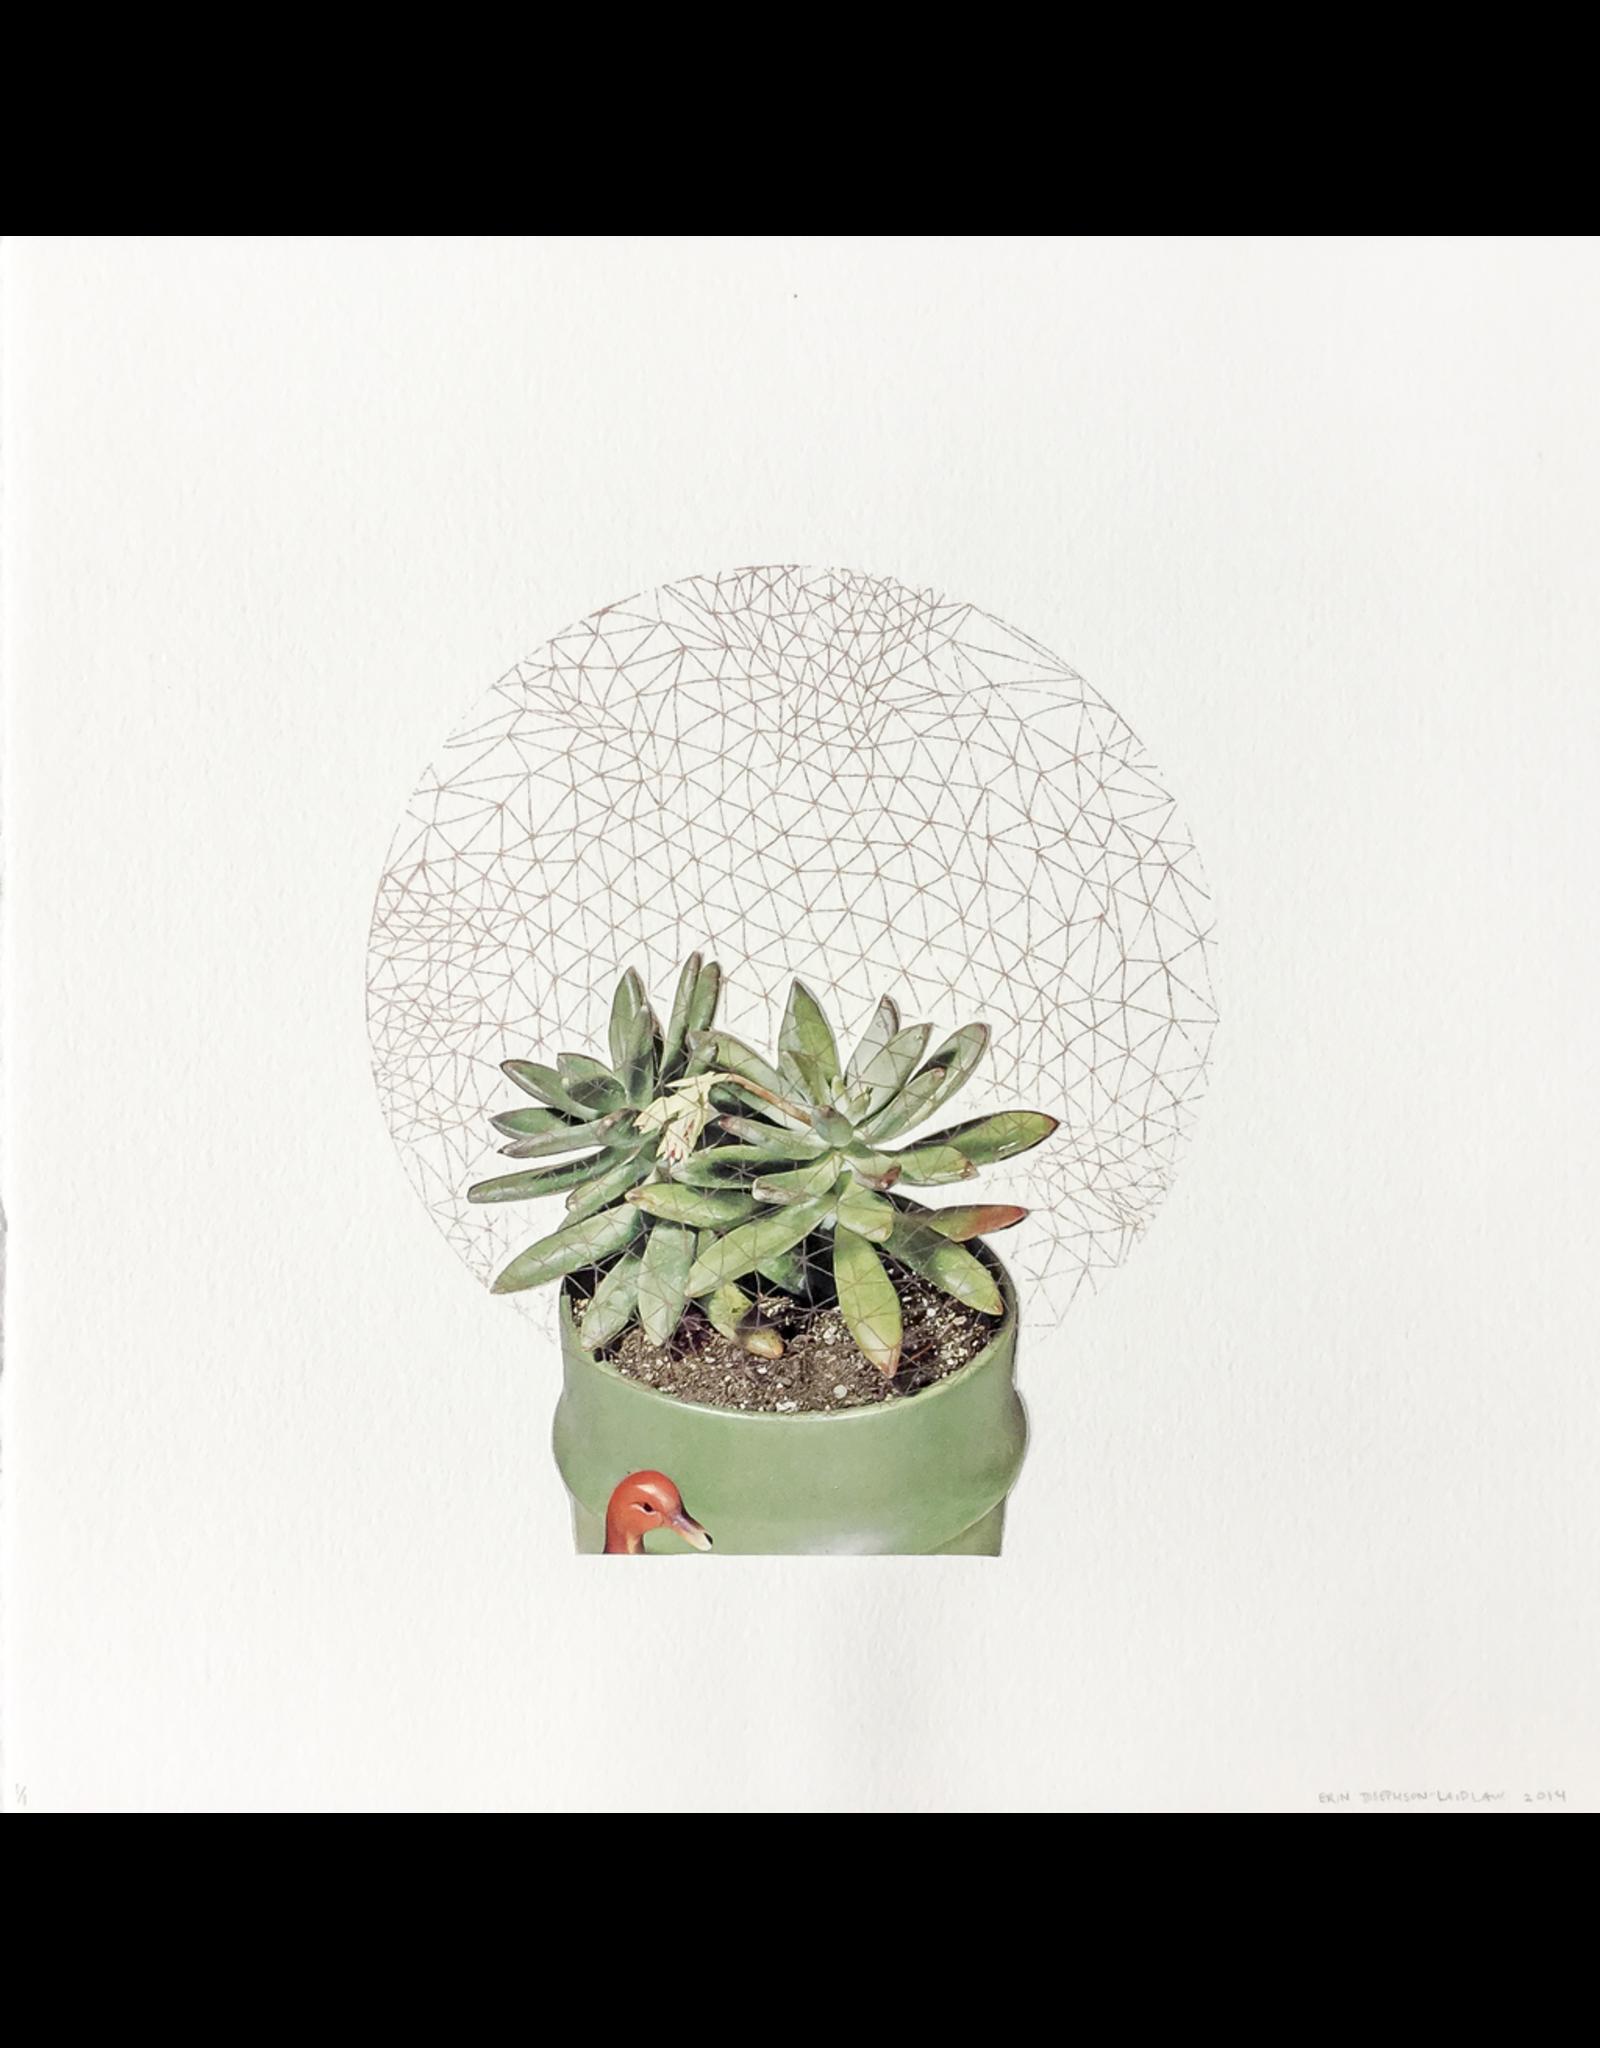 Josephson-Laidlaw, Erin Succulents, Erin Josephson-Laidlaw